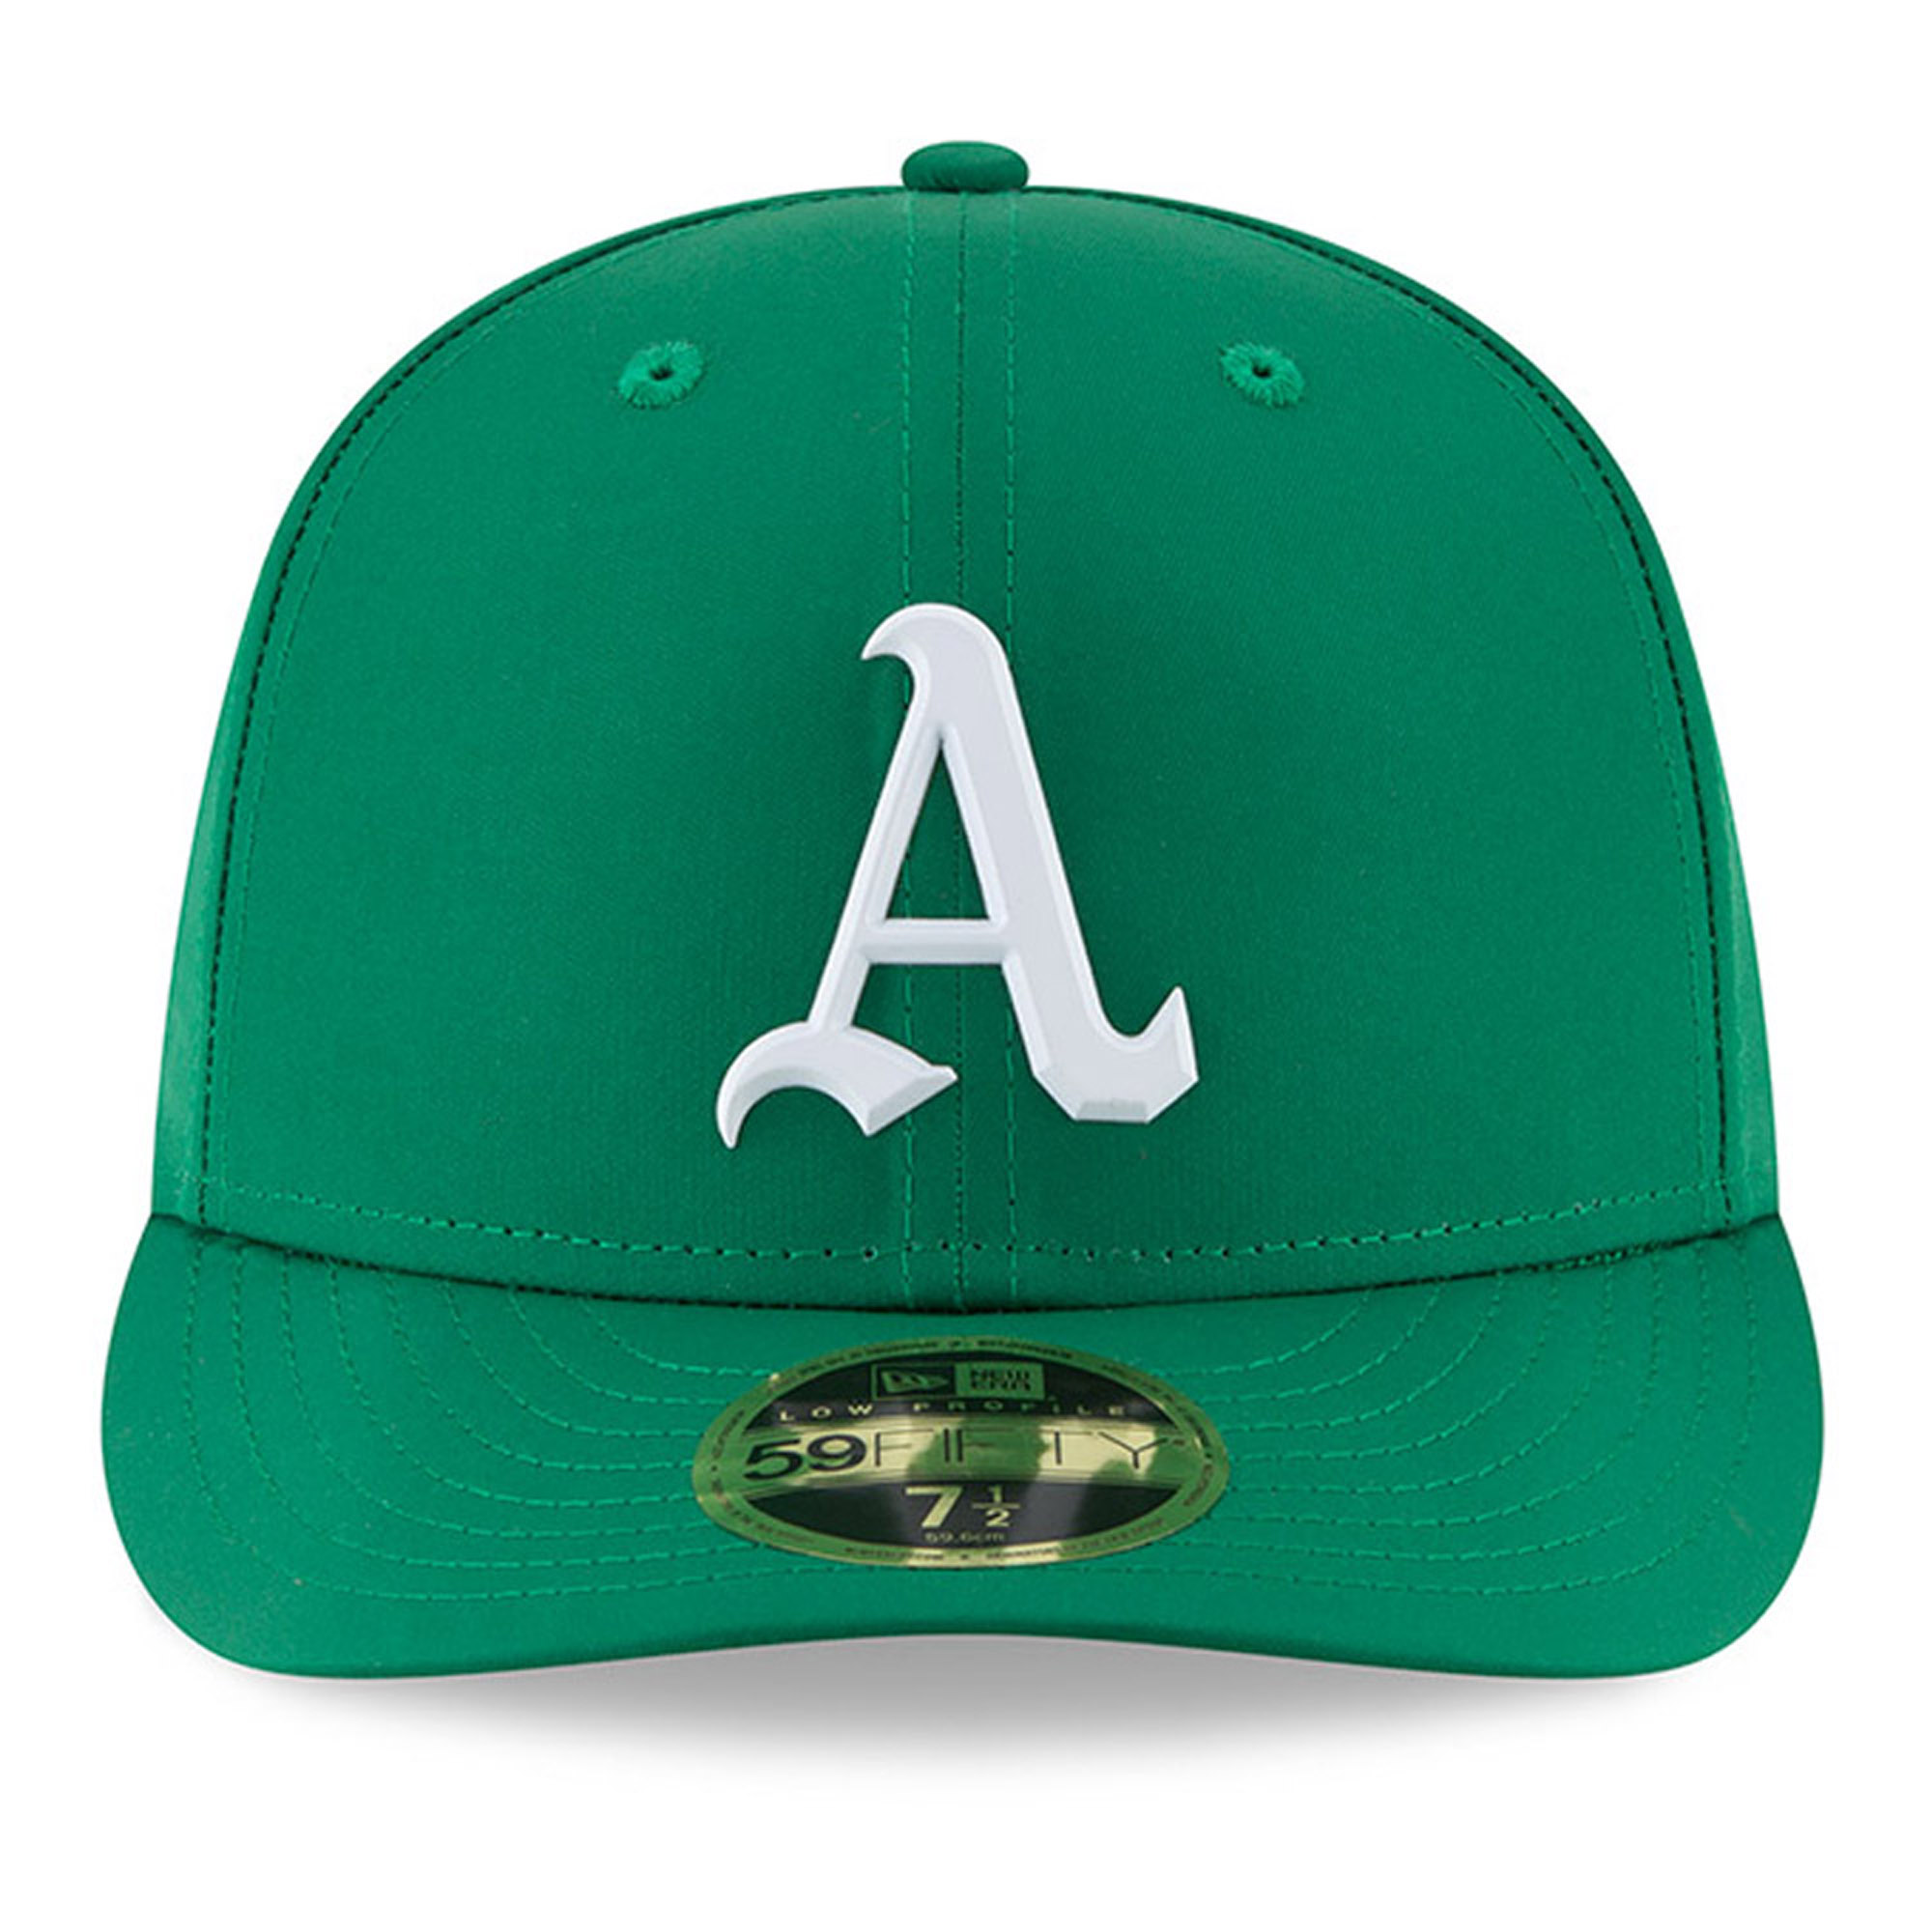 Oakland Athletics New Era 2018 St. Patrick s Day Prolight Low Profile 59FIFTY  Fitted Hat - Green - Walmart.com 217881c7e17d